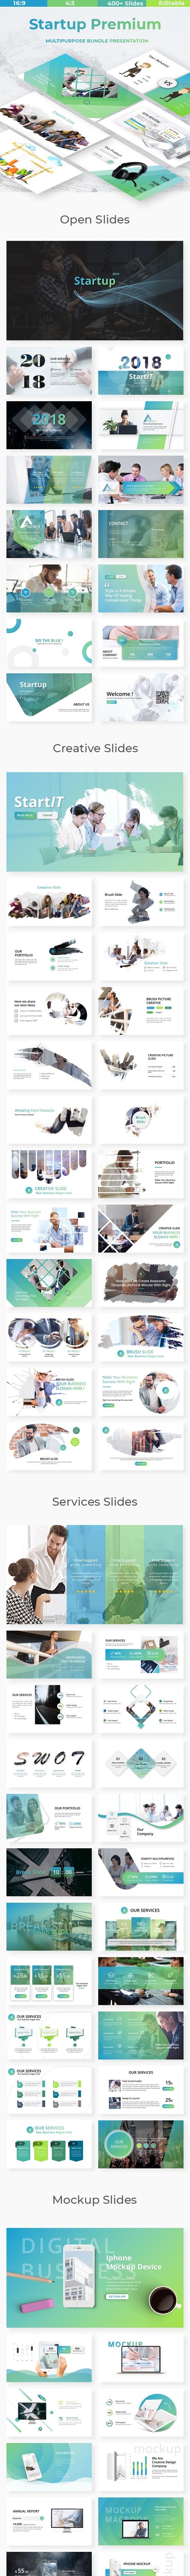 Startup Premium Powerpoint Template - Business PowerPoint Templates